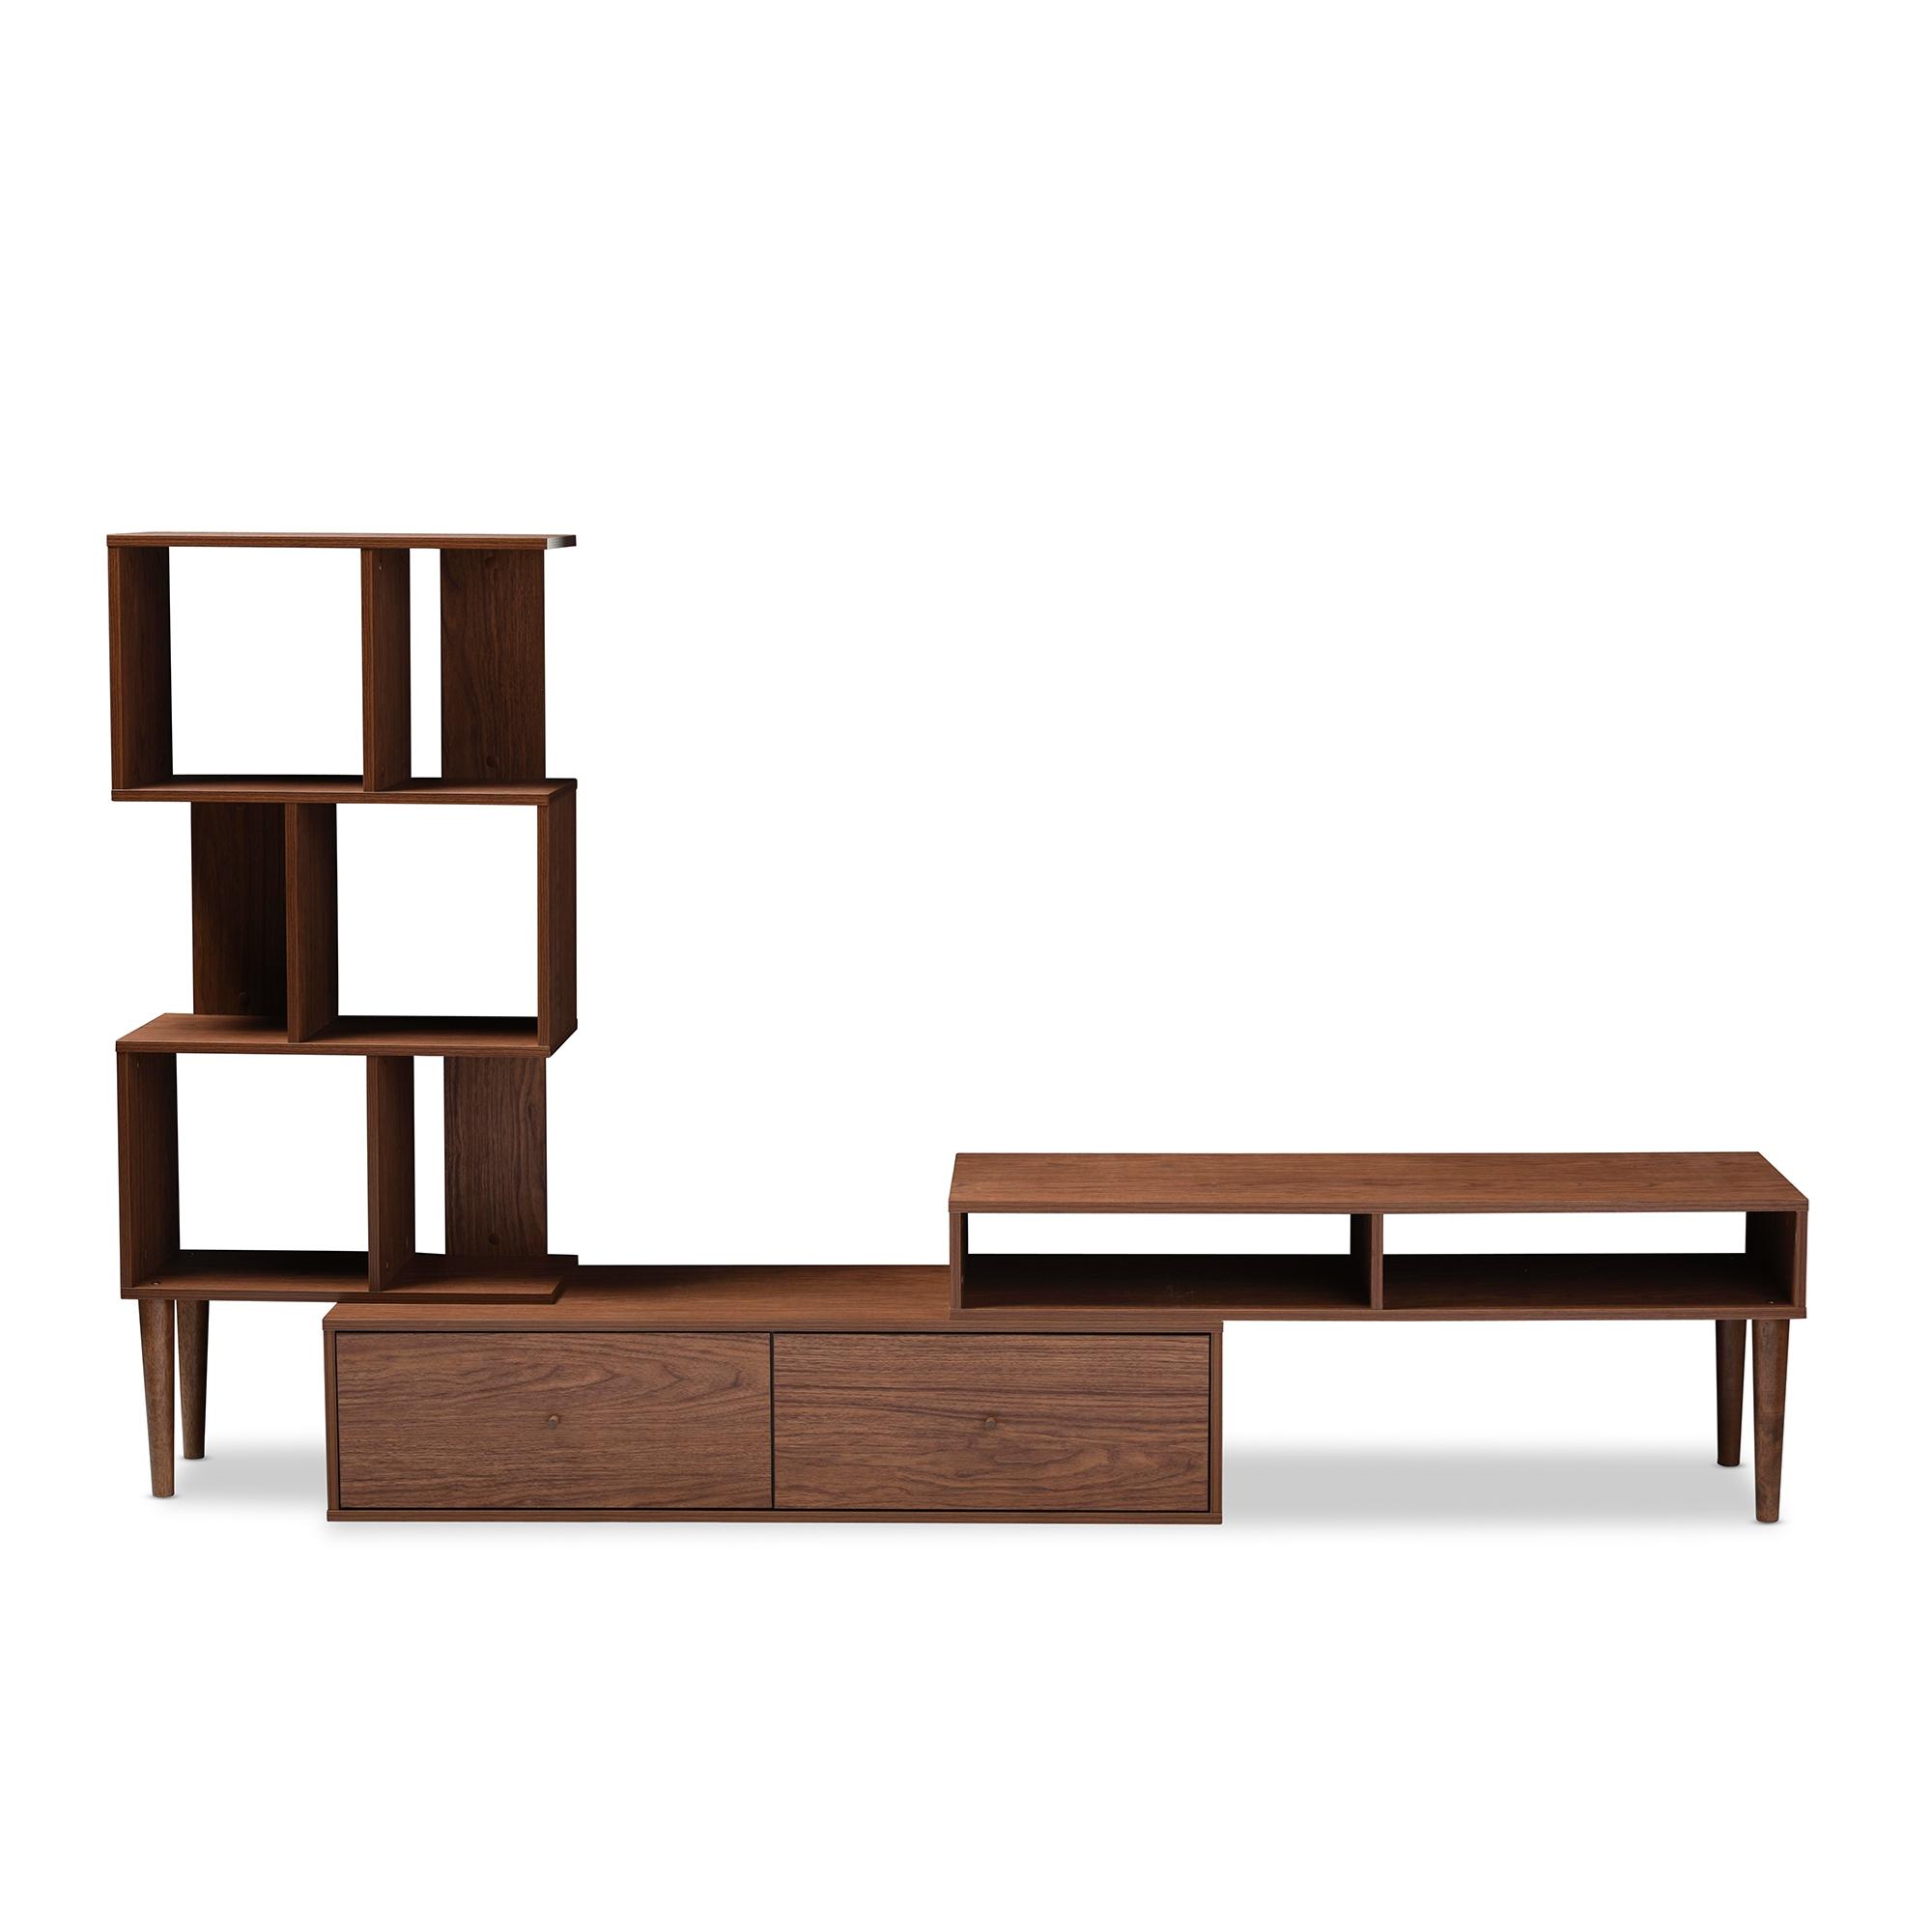 retro modern furniture. Baxton Studio Haversham Mid-century Retro Modern TV Stand Entertainment Center And Display Unit Furniture R